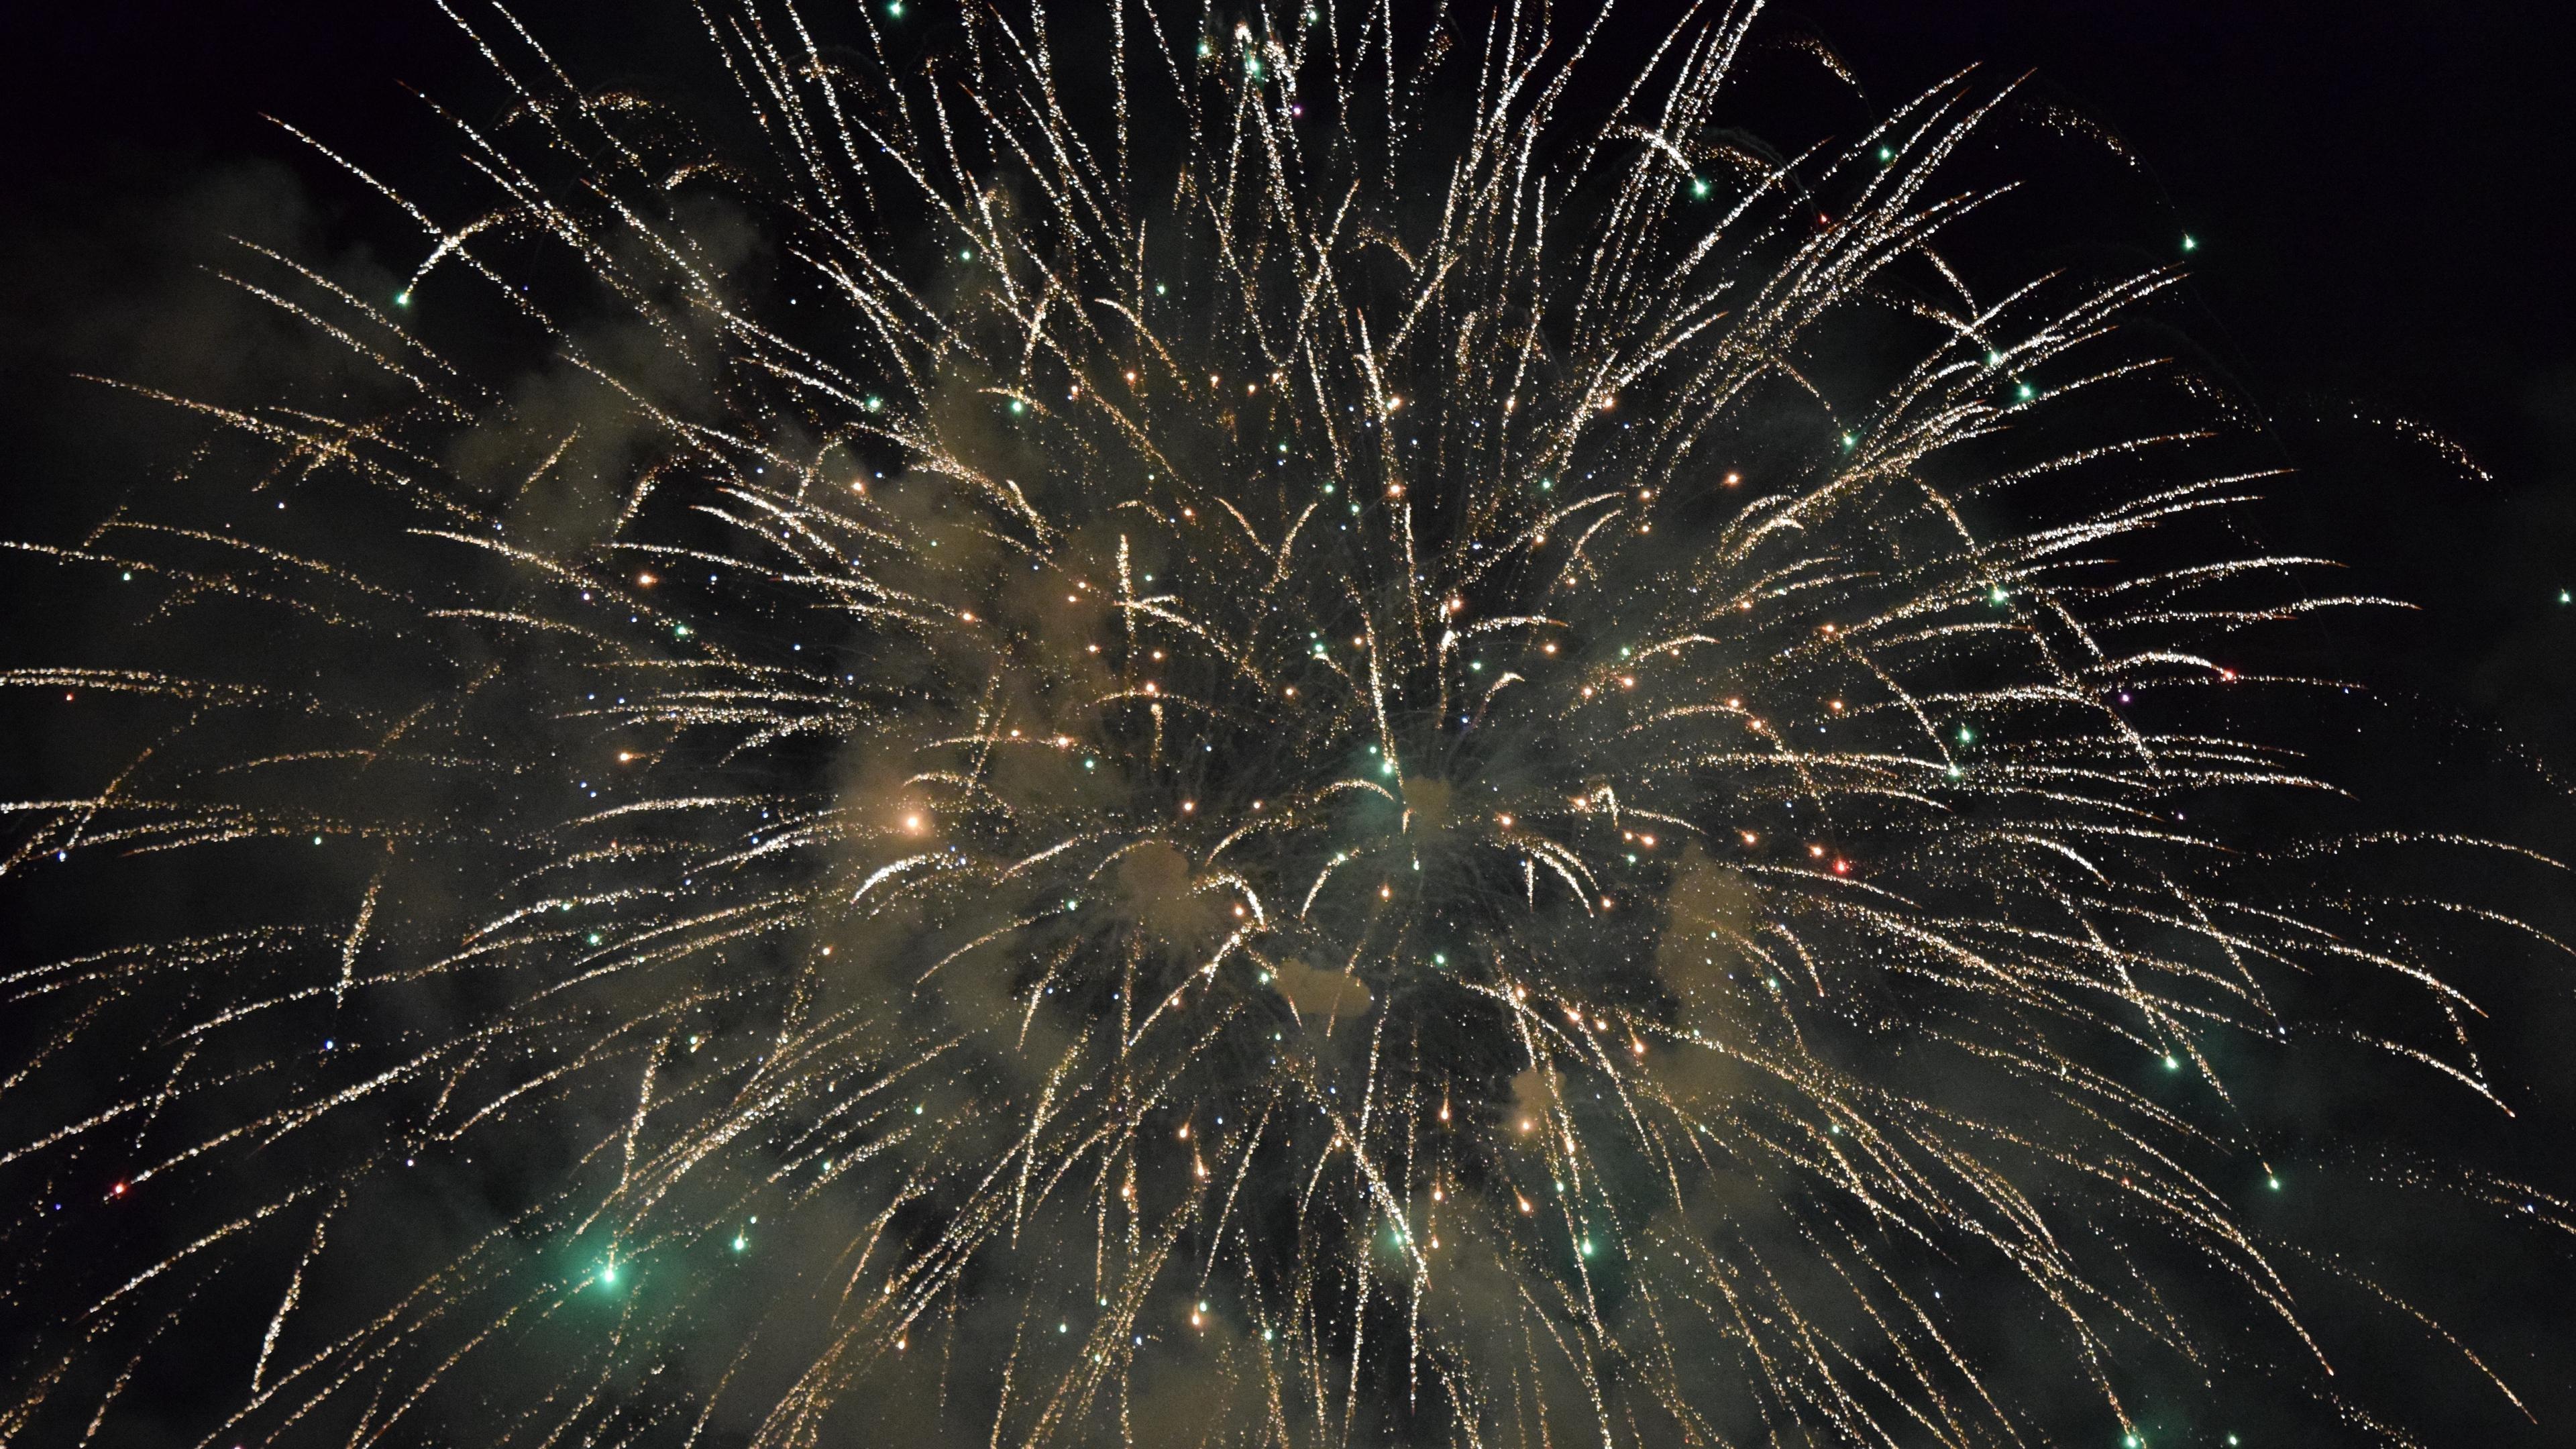 salute fireworks holiday sparks 4k 1538345075 - salute, fireworks, holiday, sparks 4k - salute, Holiday, Fireworks